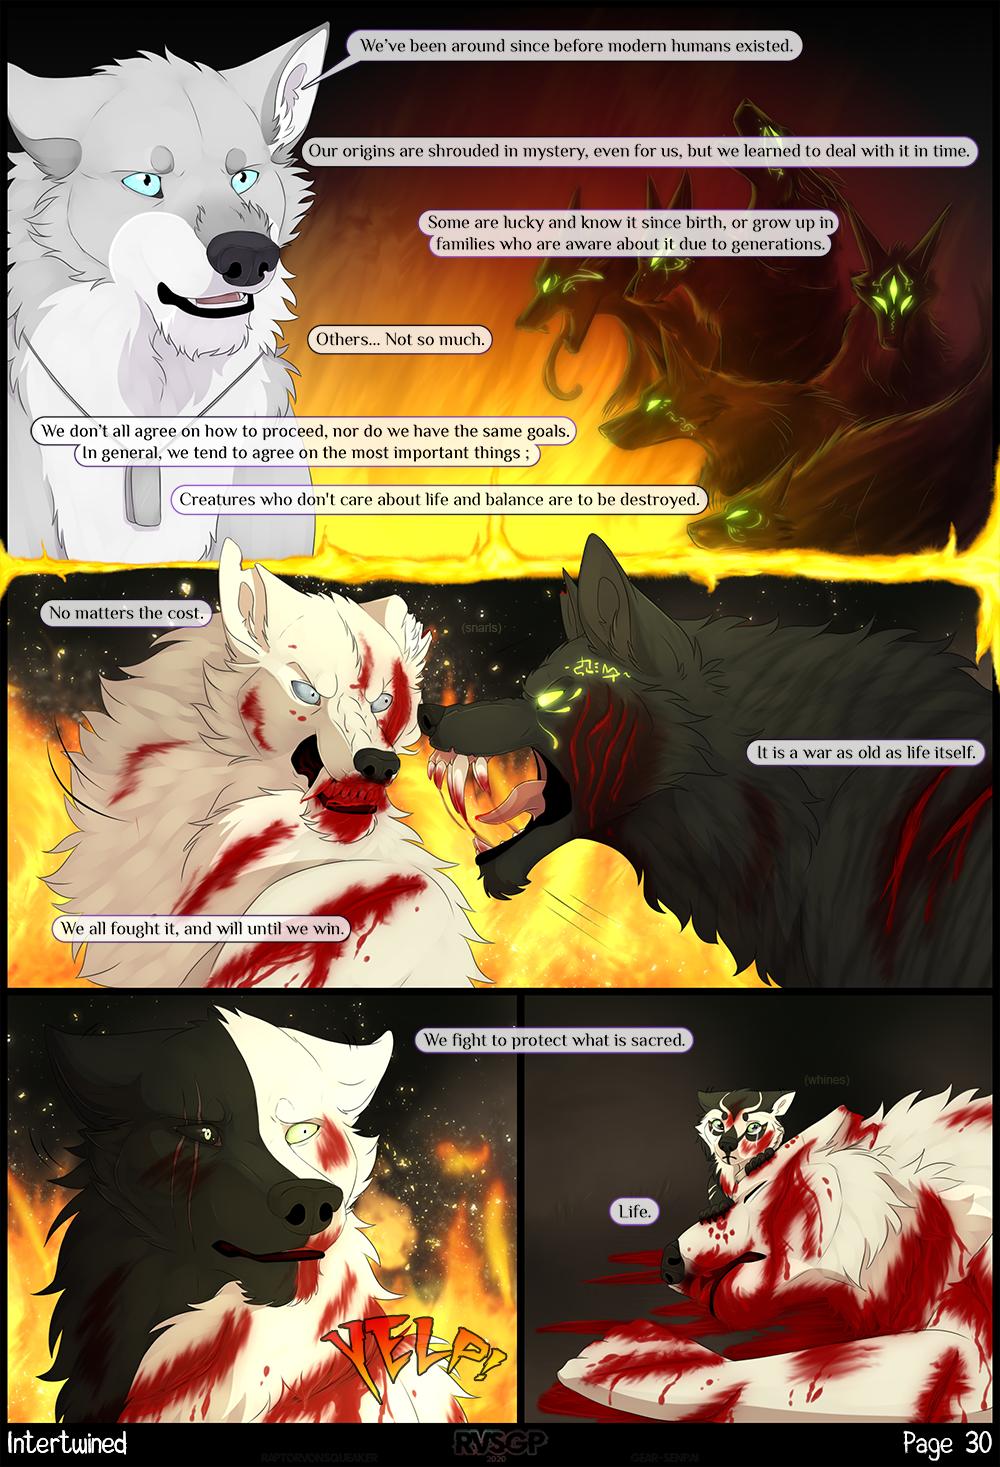 Page 30 - Life.